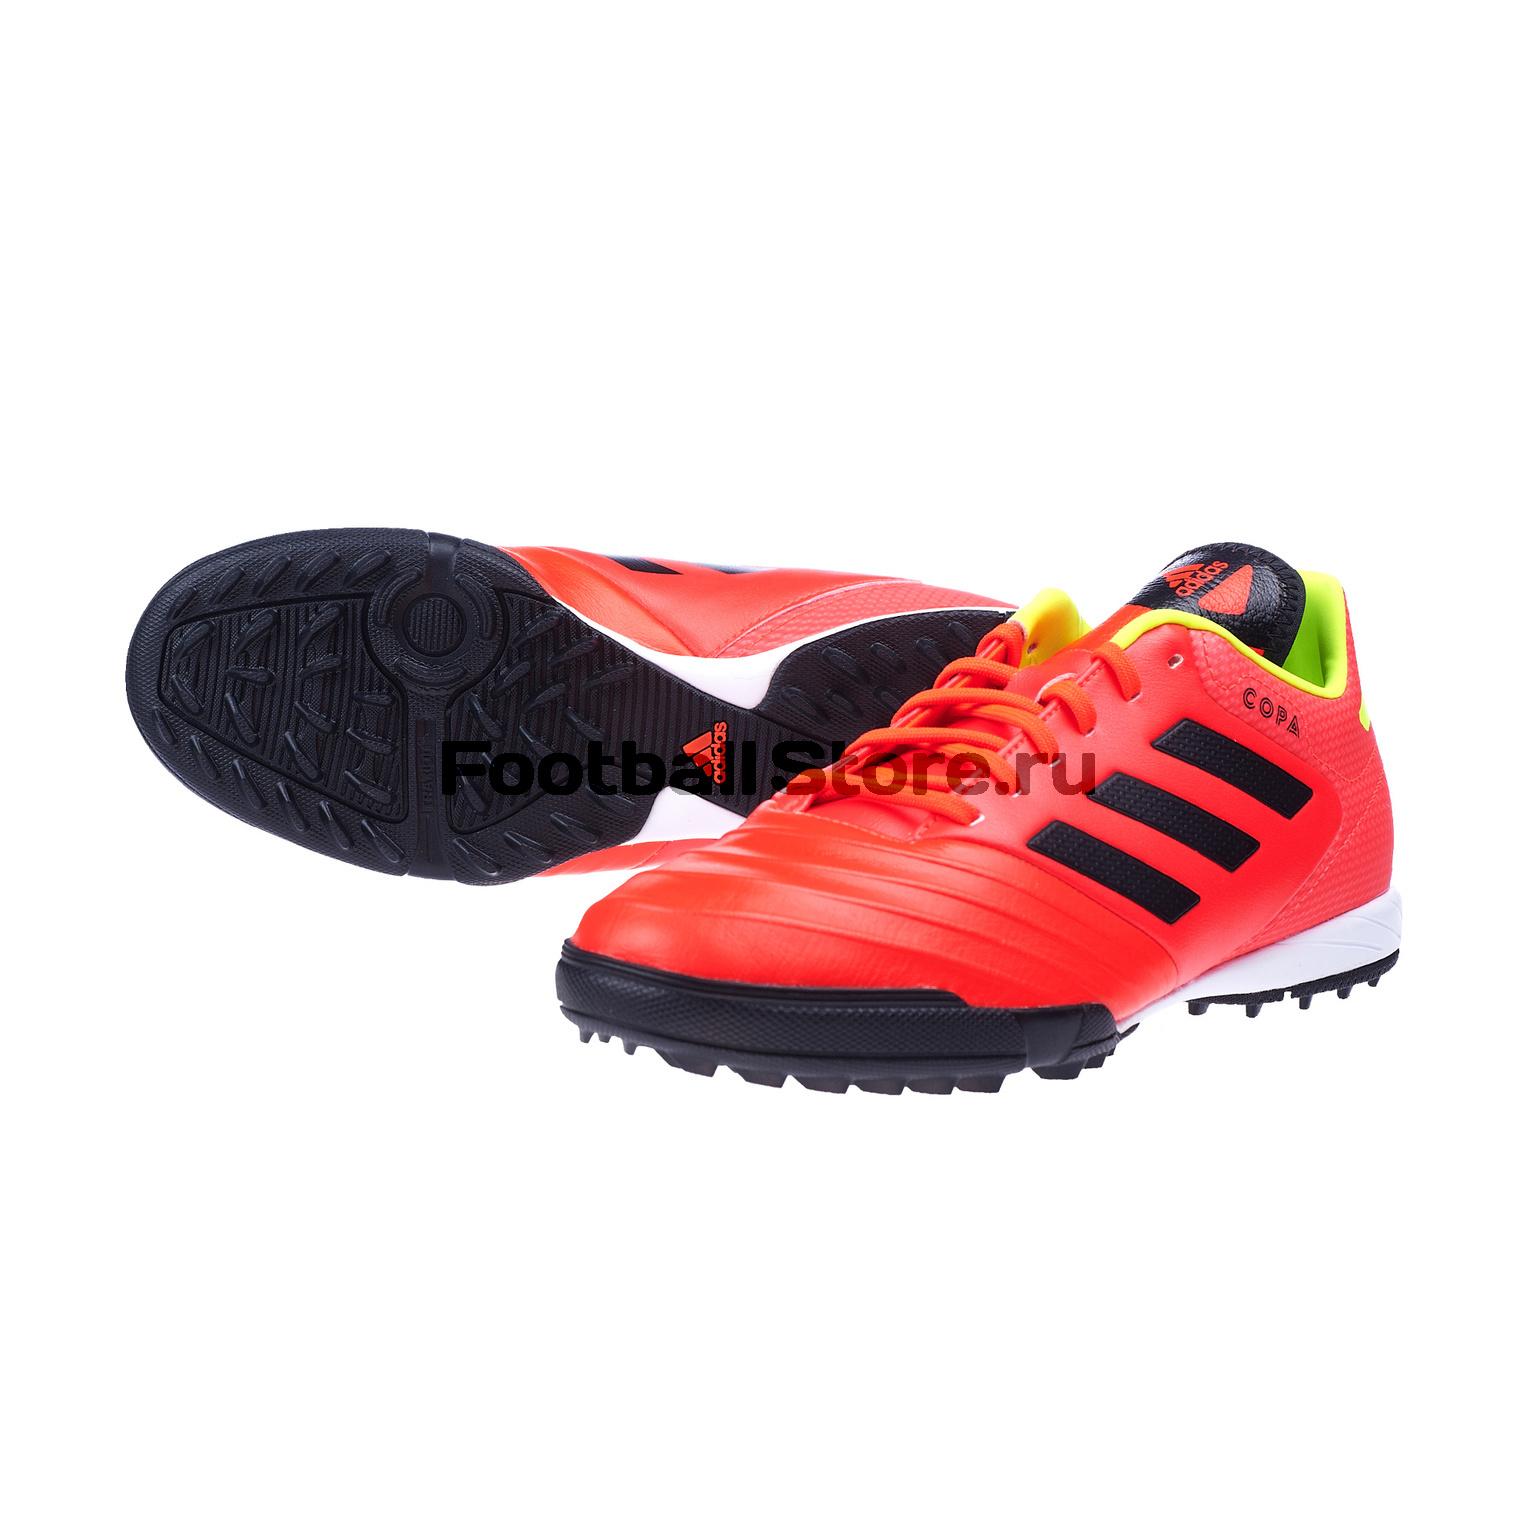 Шиповки Adidas Copa Tango 18.3 TF DB2415 цена